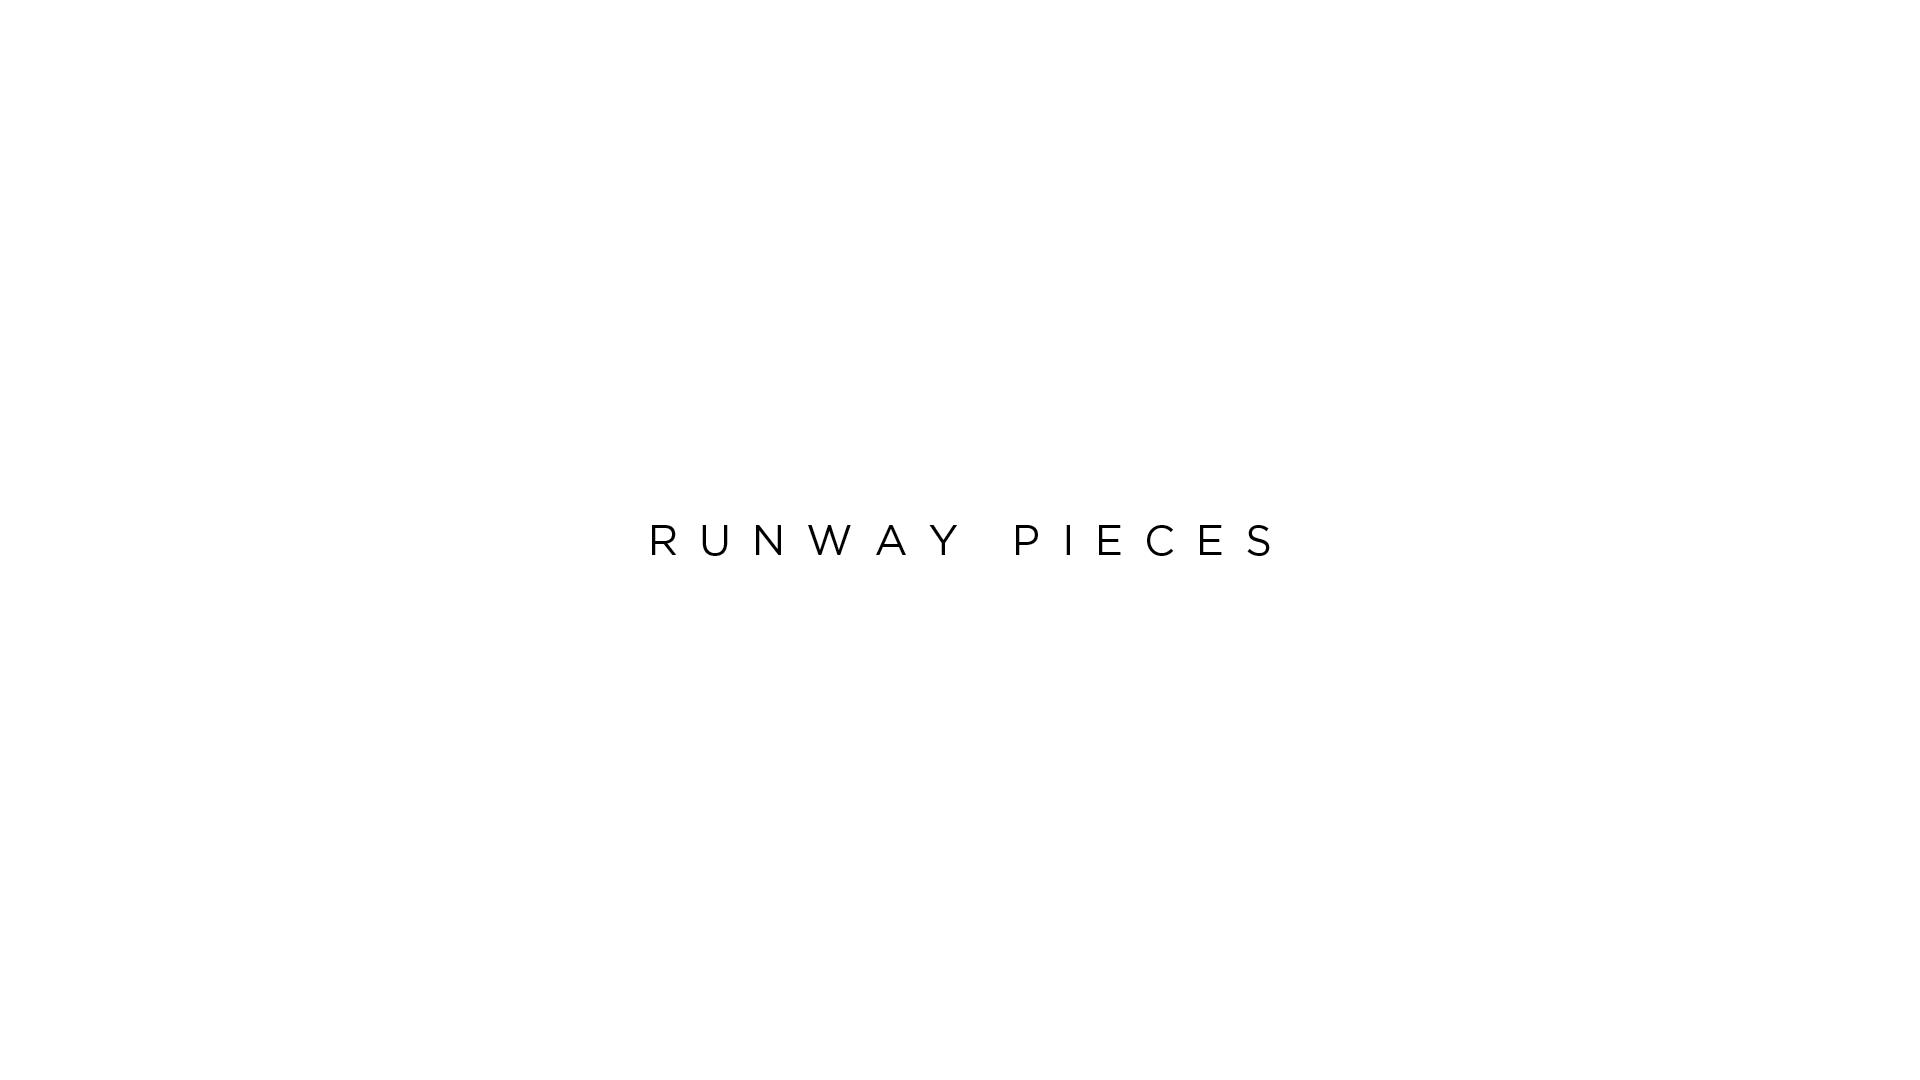 Runway pieces